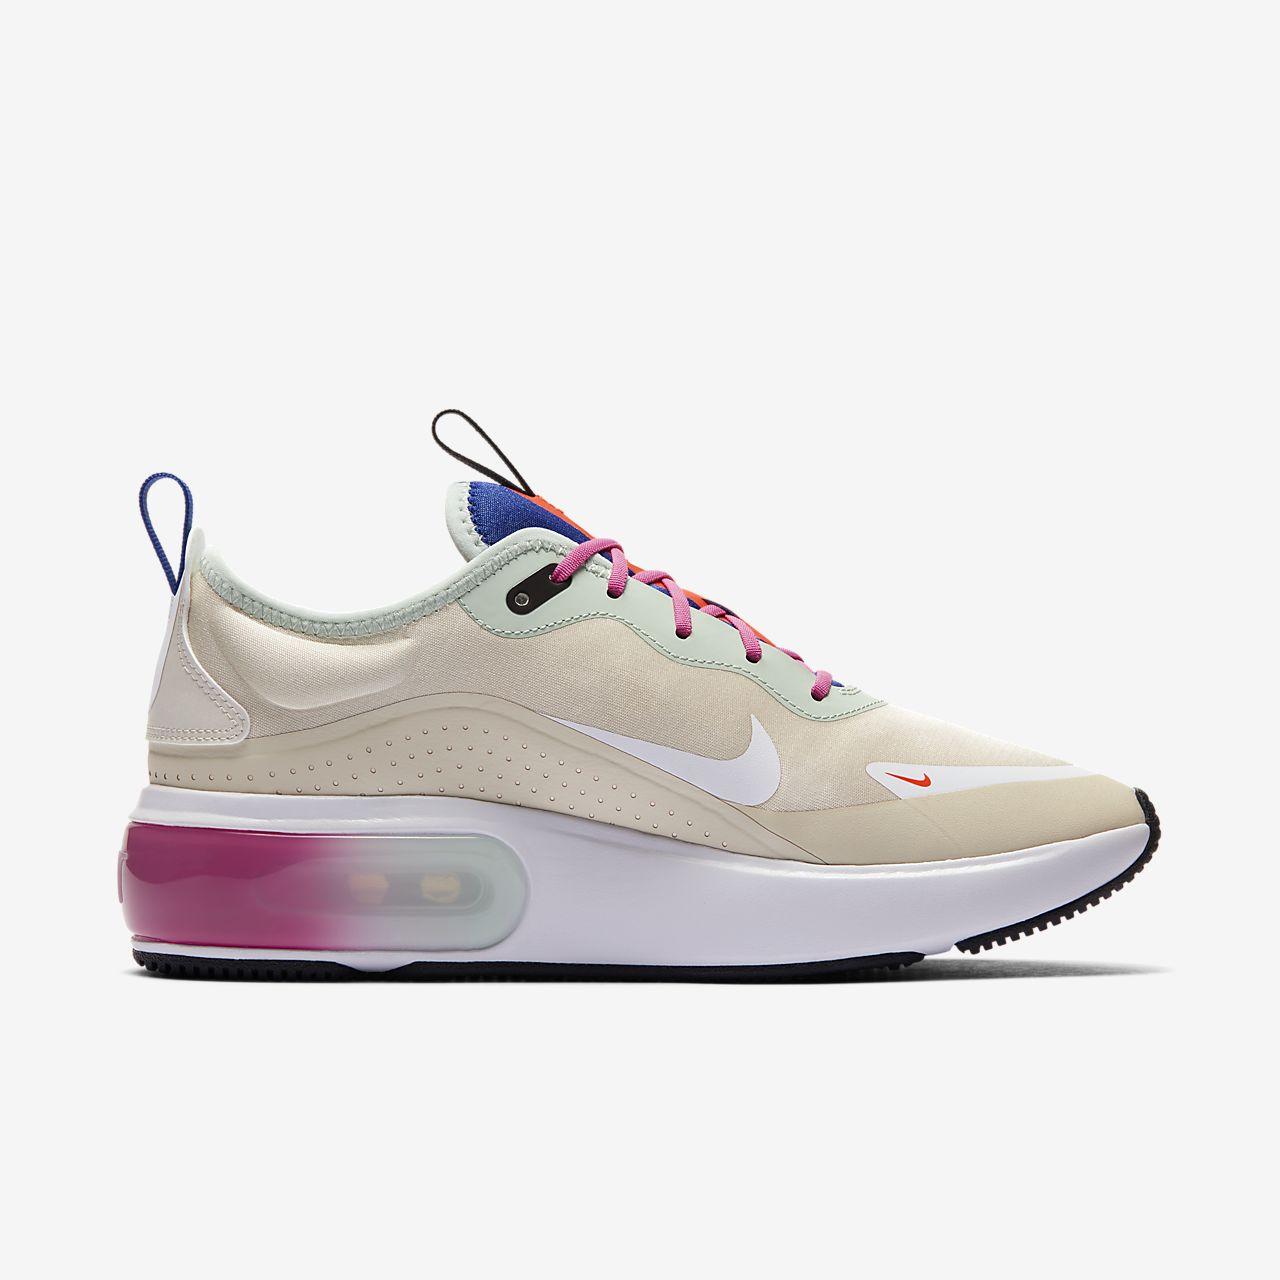 Nike Air Max Dia Damesschoen. Nike NL